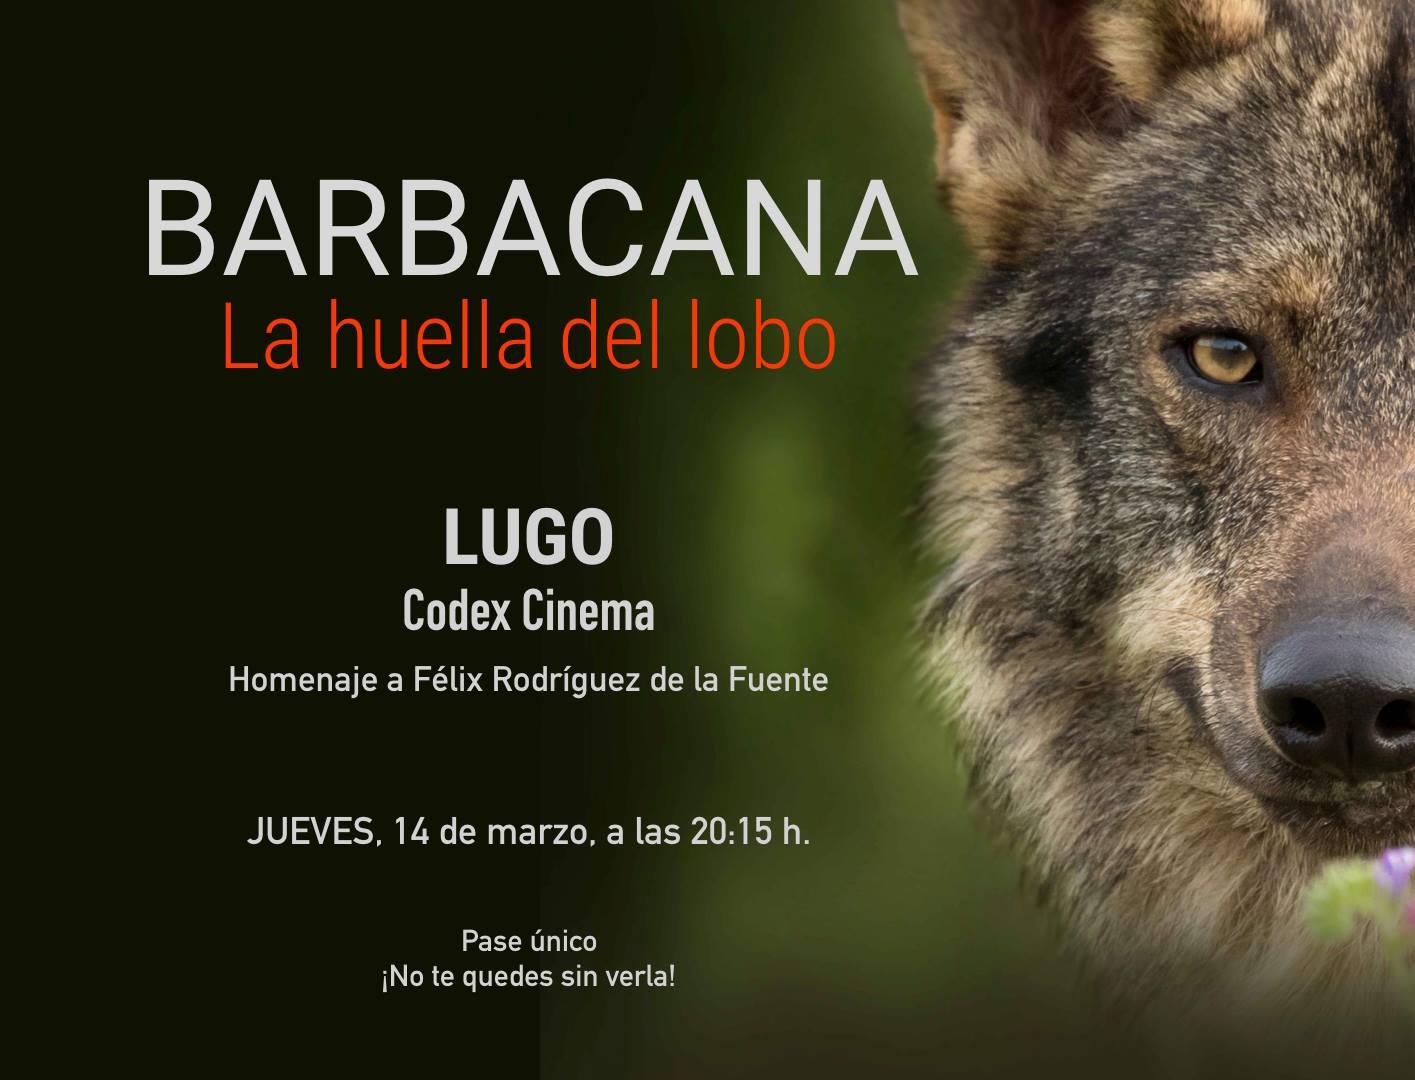 Barbacana, la huella del lobo homenaje a Félix Rodríguez de la Fuente